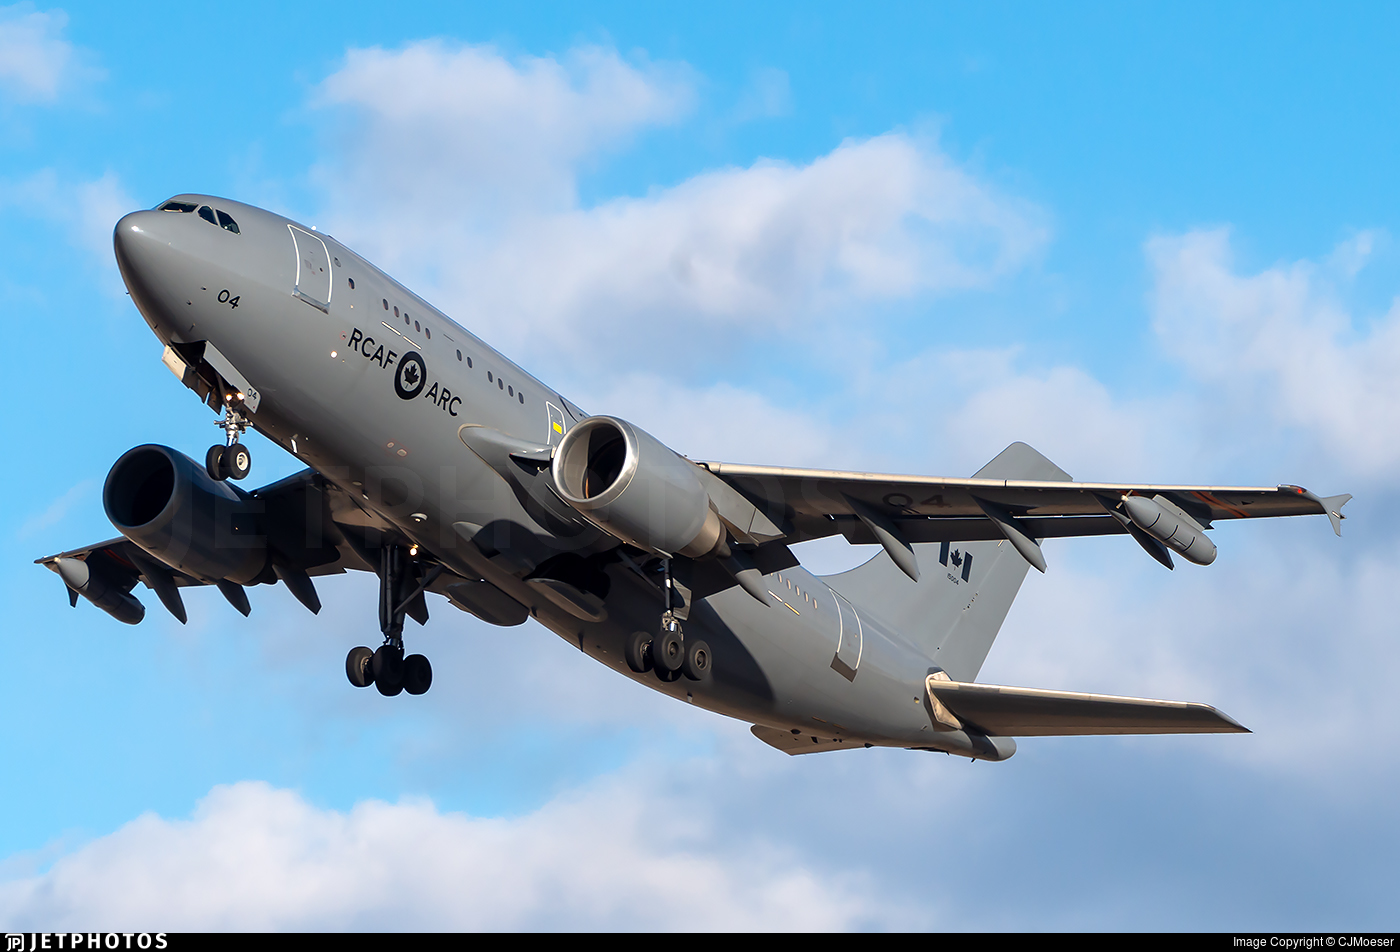 15004 - Airbus CC-150 Polaris - Canada - Royal Canadian Air Force (RCAF)